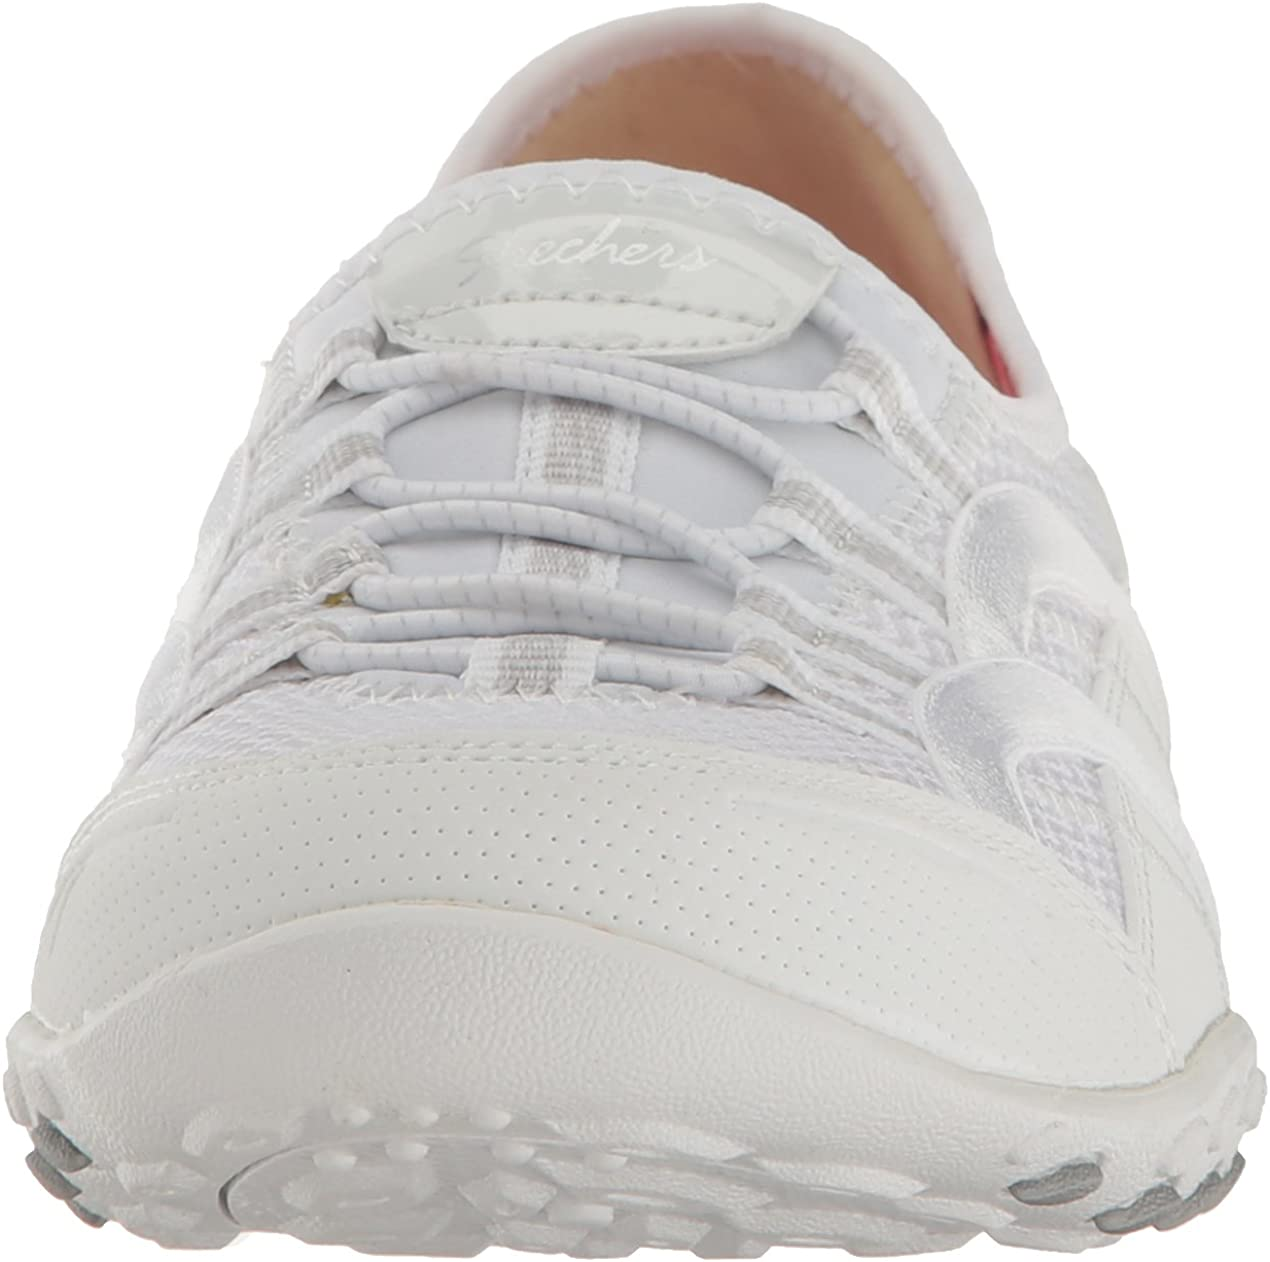 Skechers Sport Women's Breathe Easy Faithful Fashion Sneaker White